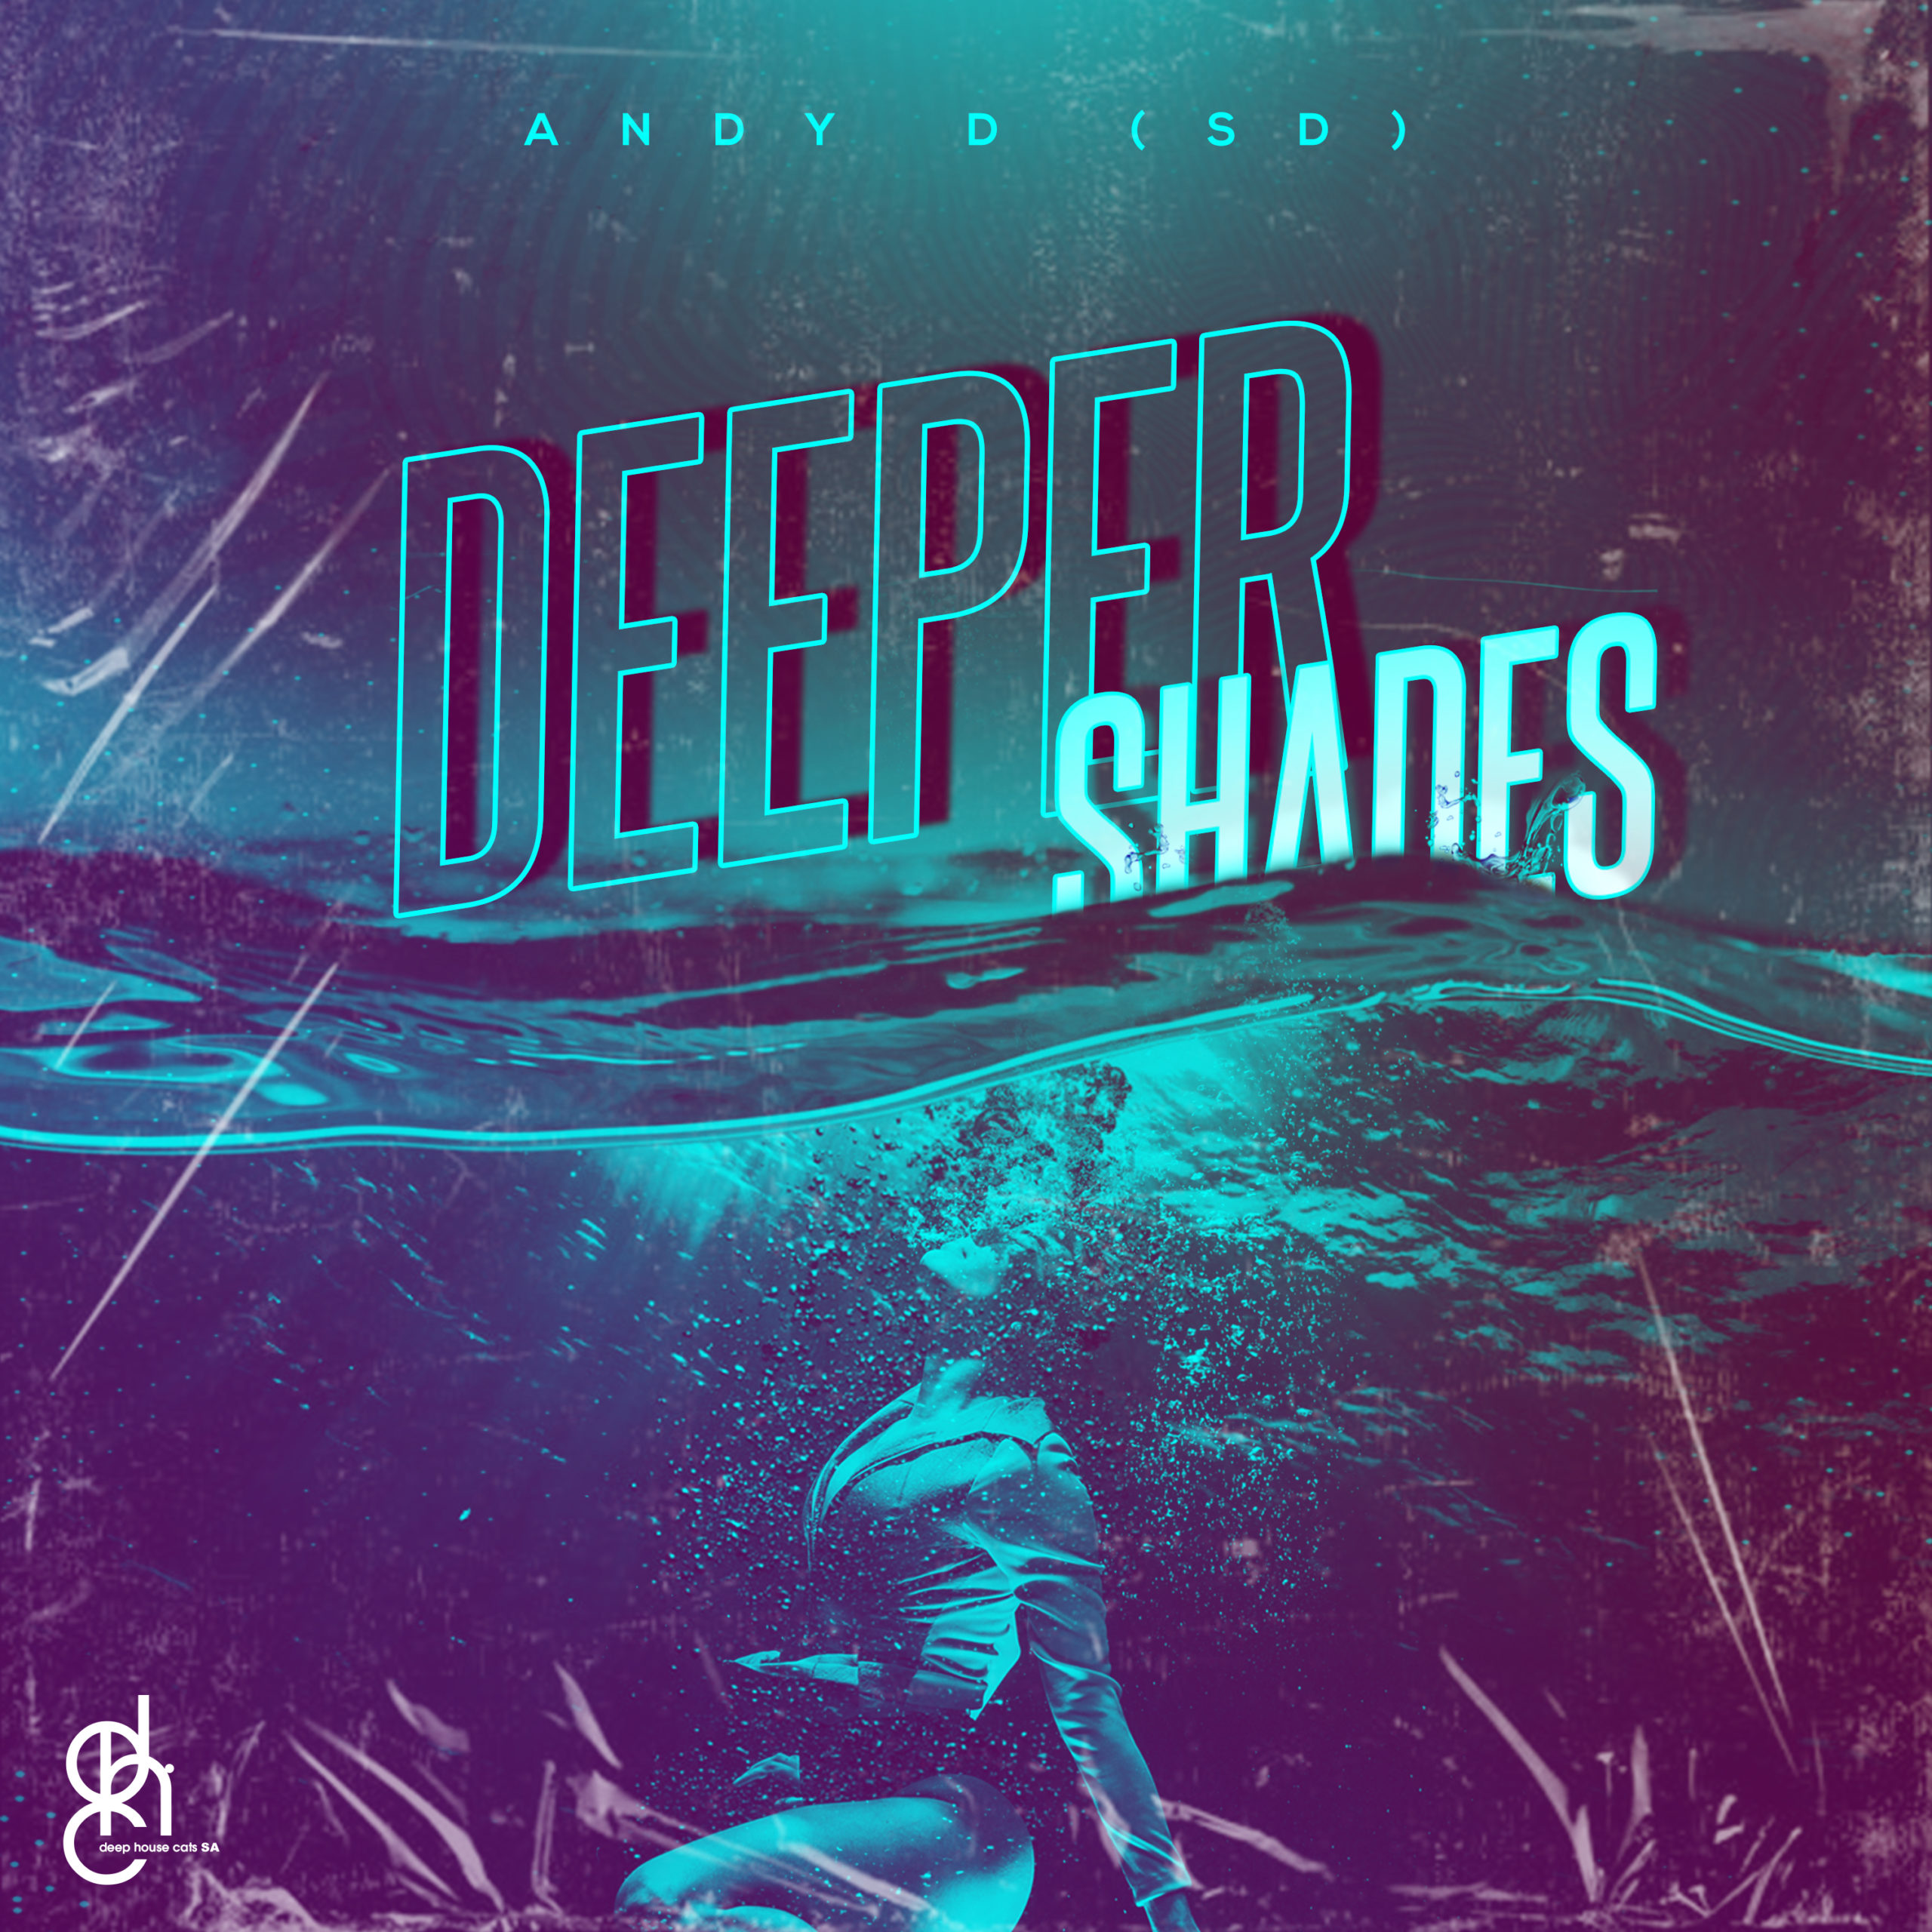 Deeper Shades